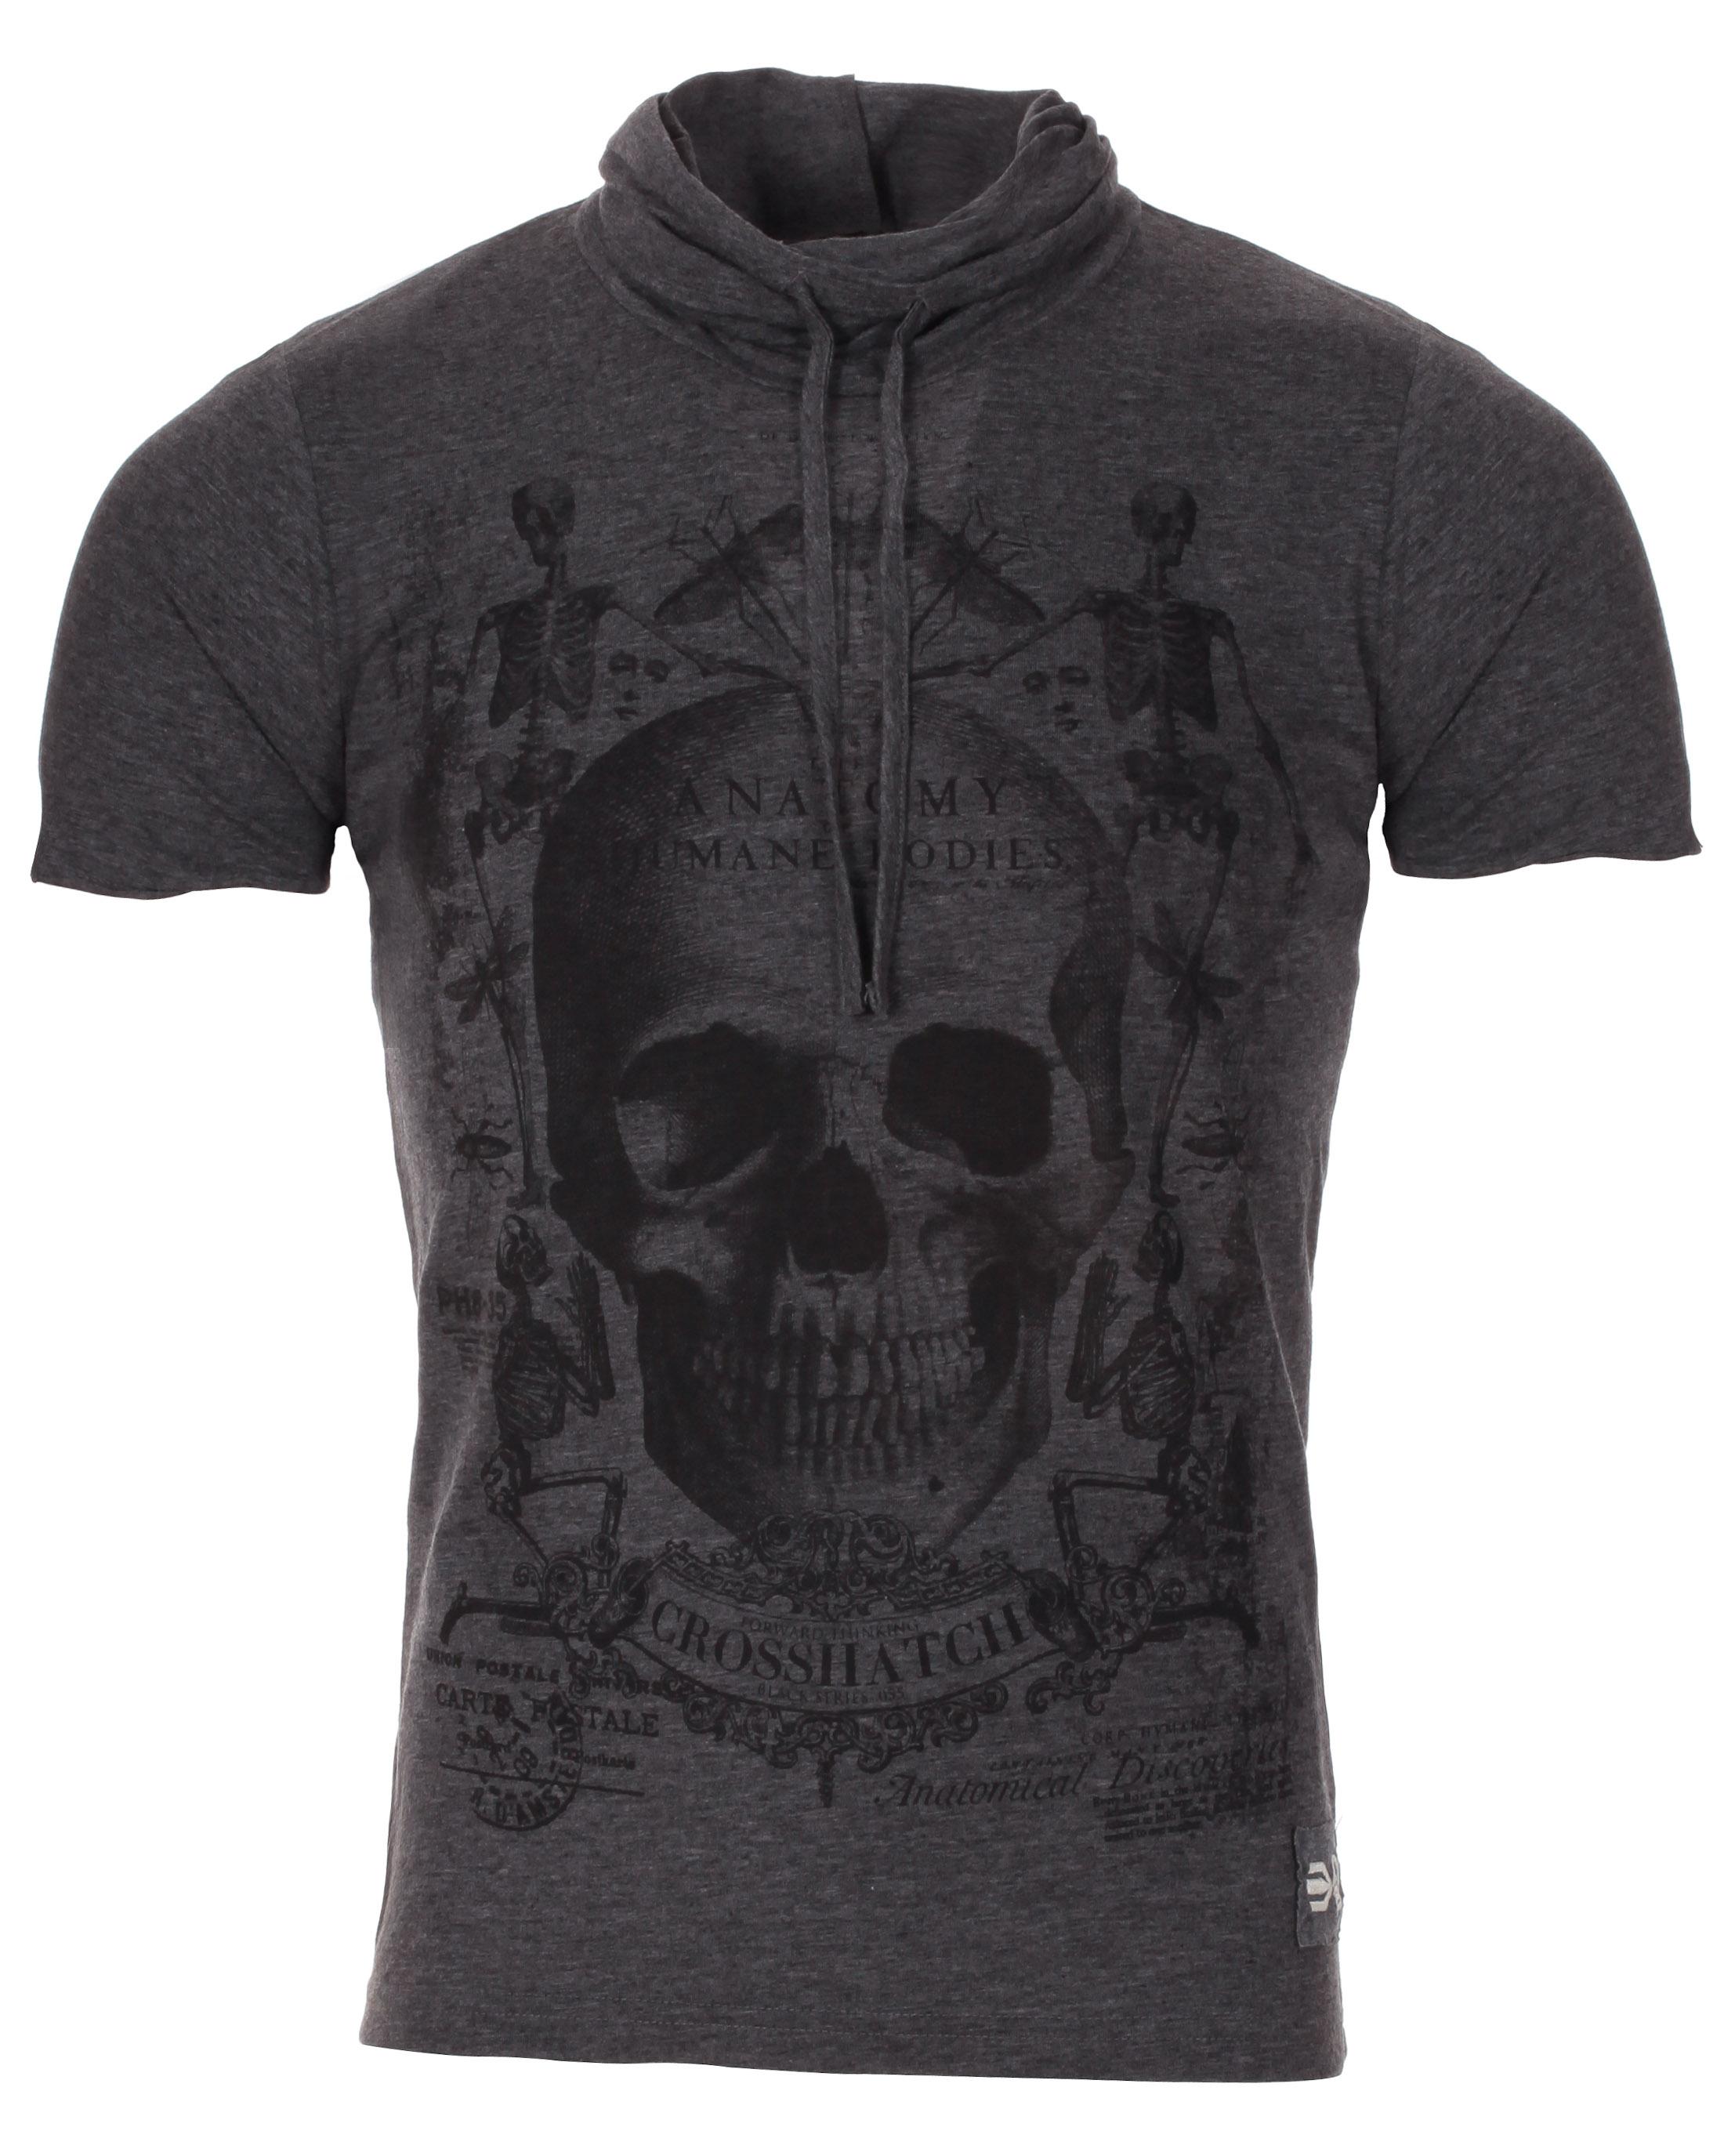 Blue-Inc-Mens-Crosshatch-Skull-Cowl-Neck-T-Shirt-Dark-Grey-New